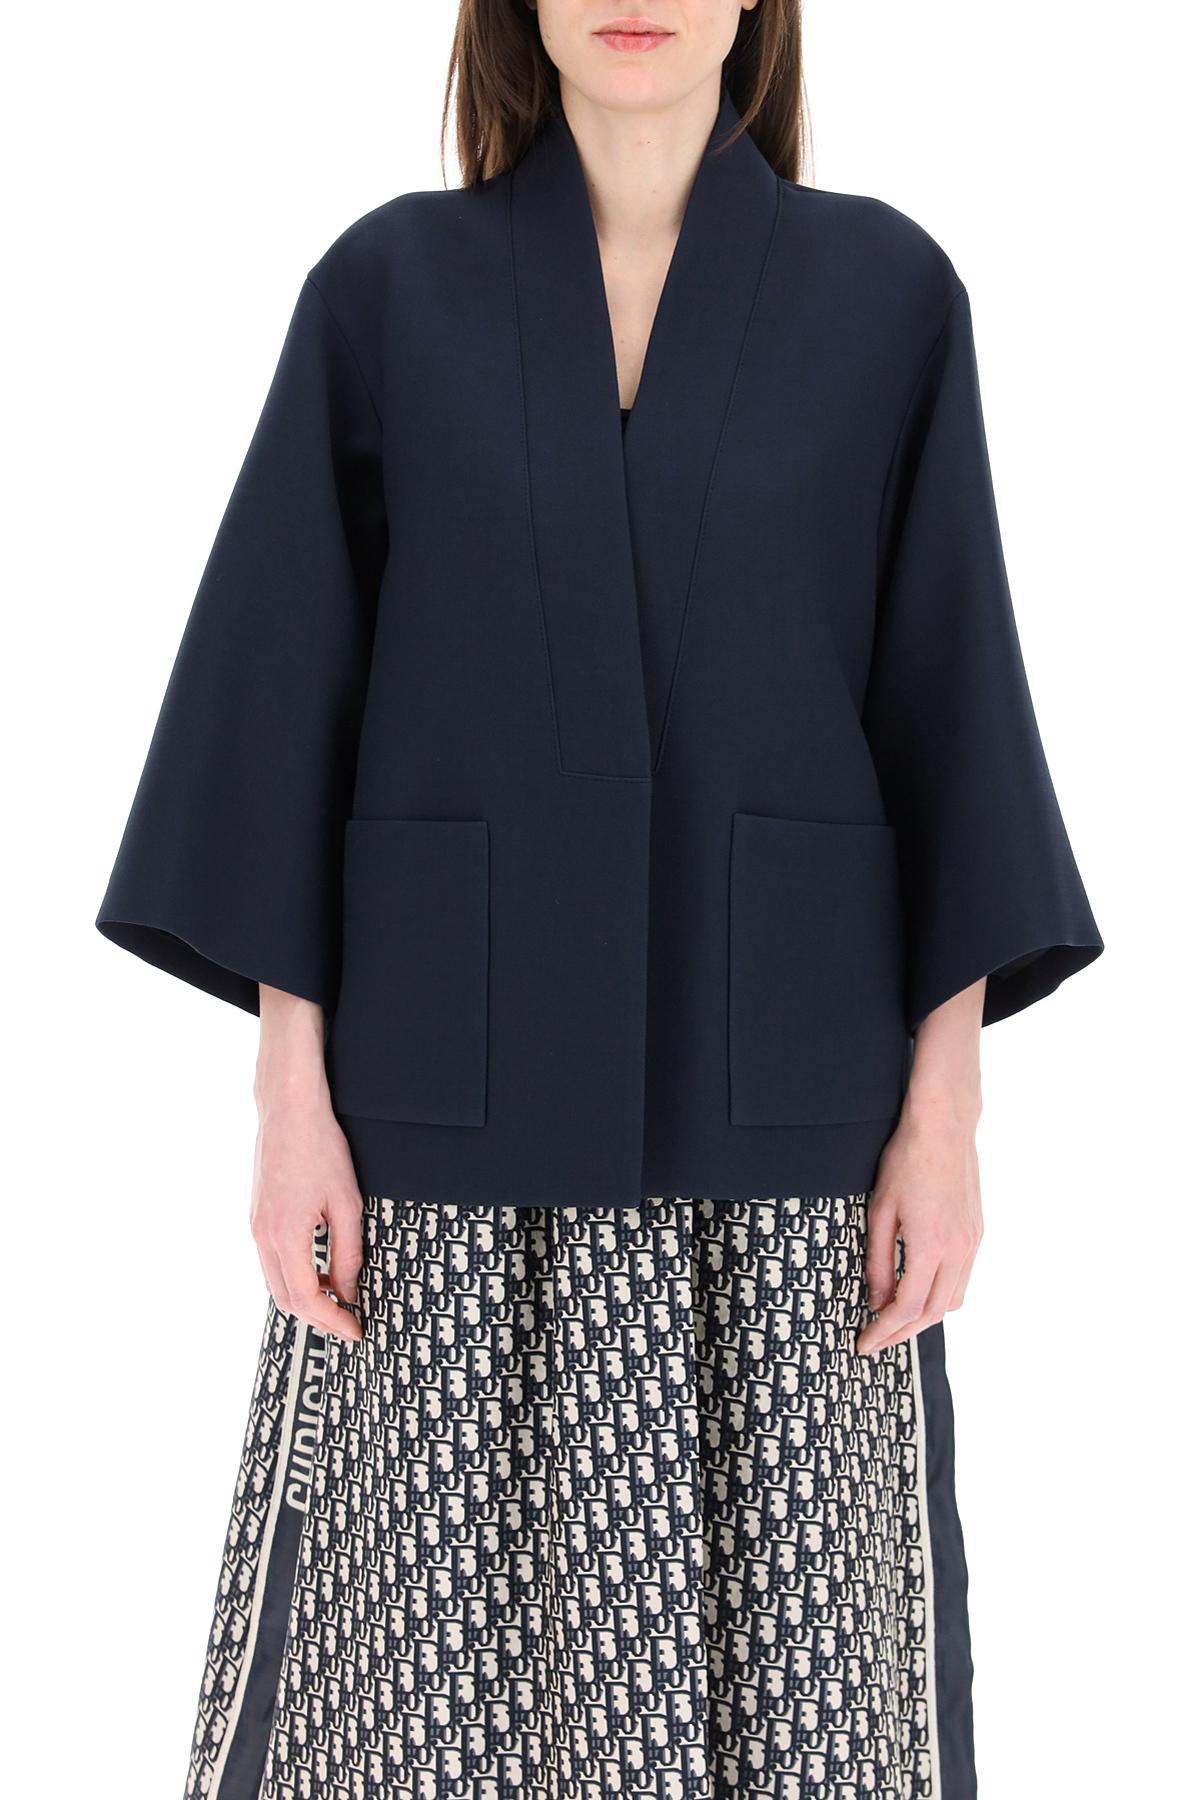 Dior giacca palto'